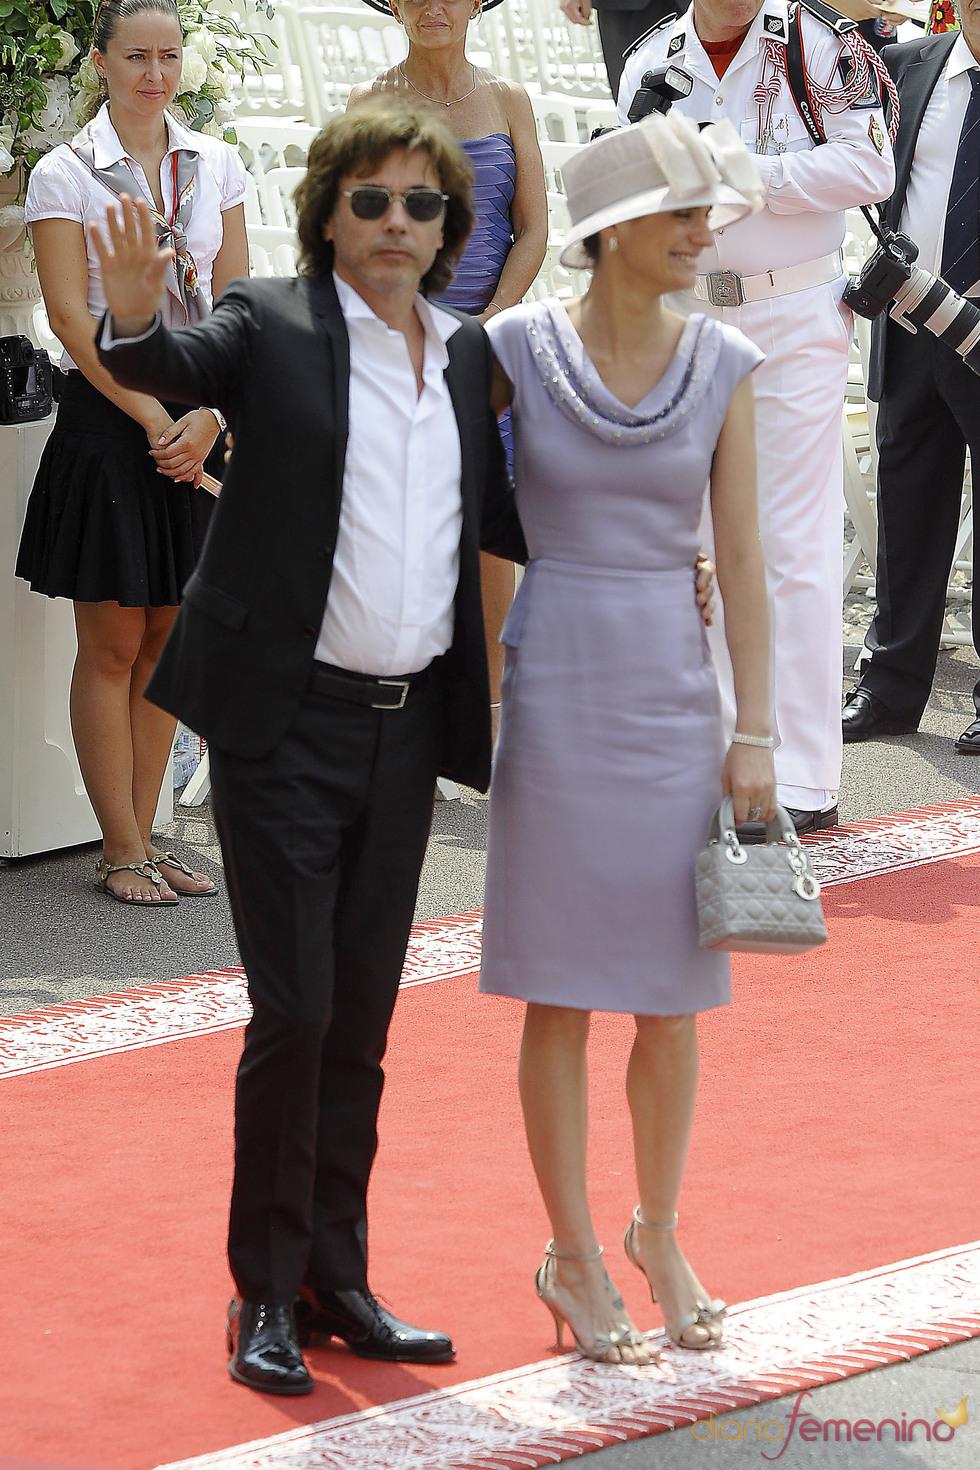 Jean Michel Jarre llega a la ceremonia religiosa de la Boda Real de Mónaco